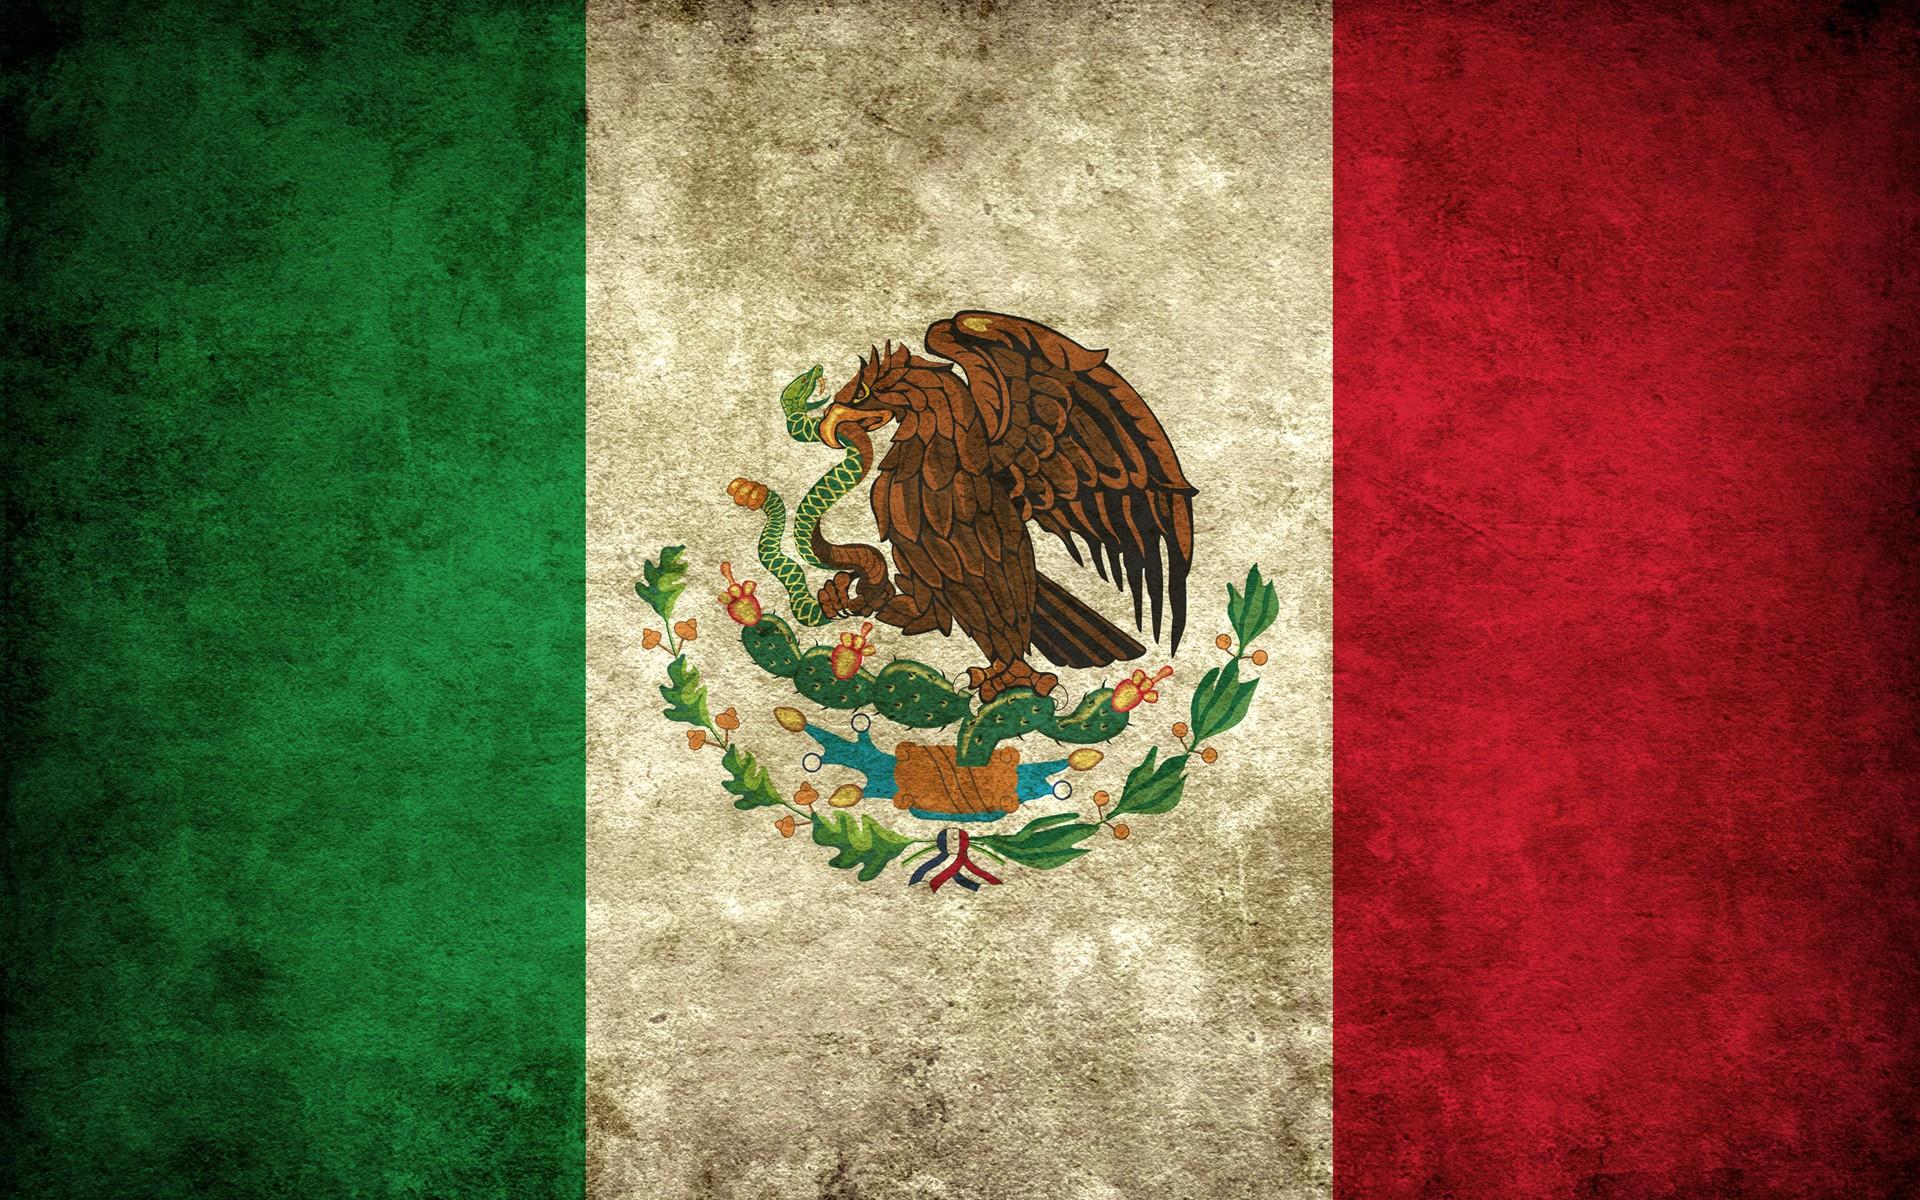 General 1920x1200 flag Mexico green red grunge white cactus eagle snake serpent beige birds artwork